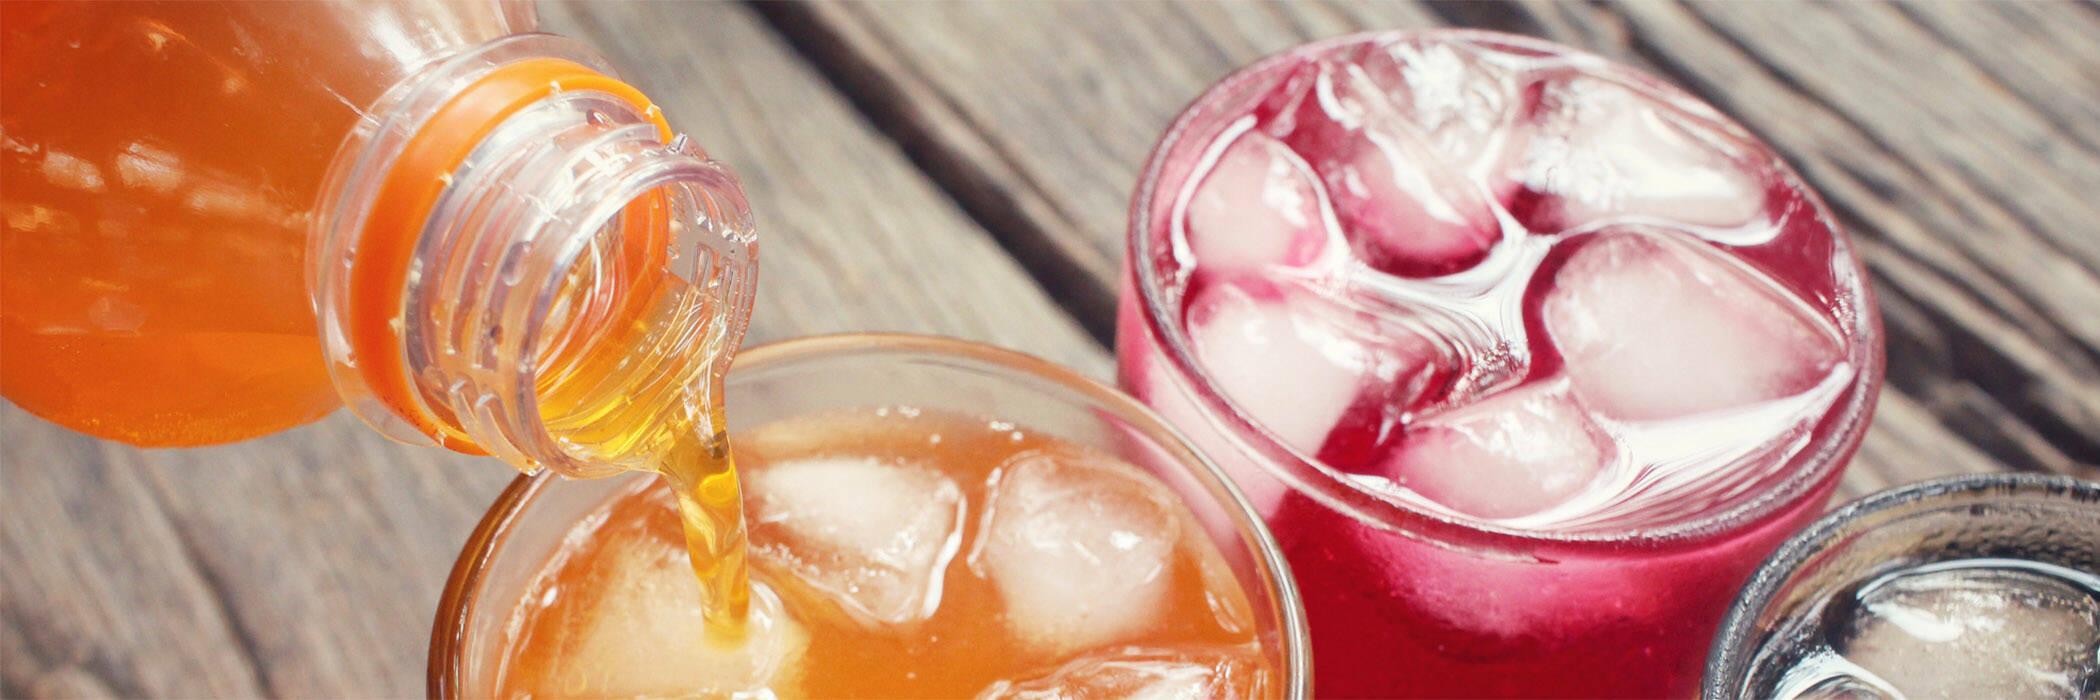 21mar time to tax sugary drinks1 hero